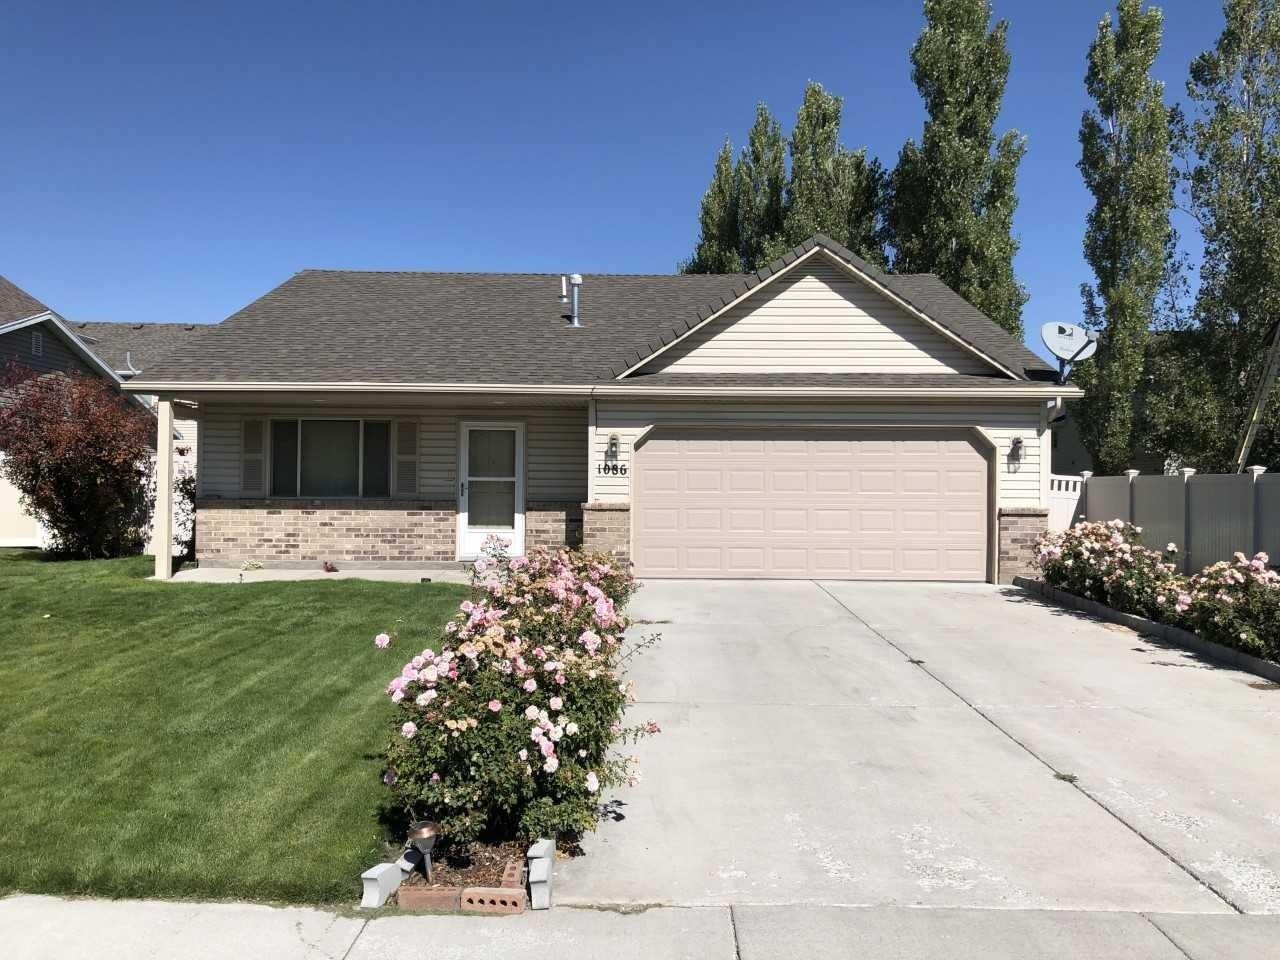 1086 Cornerstone Dr, Idaho Falls, ID 83401 Rental Listing